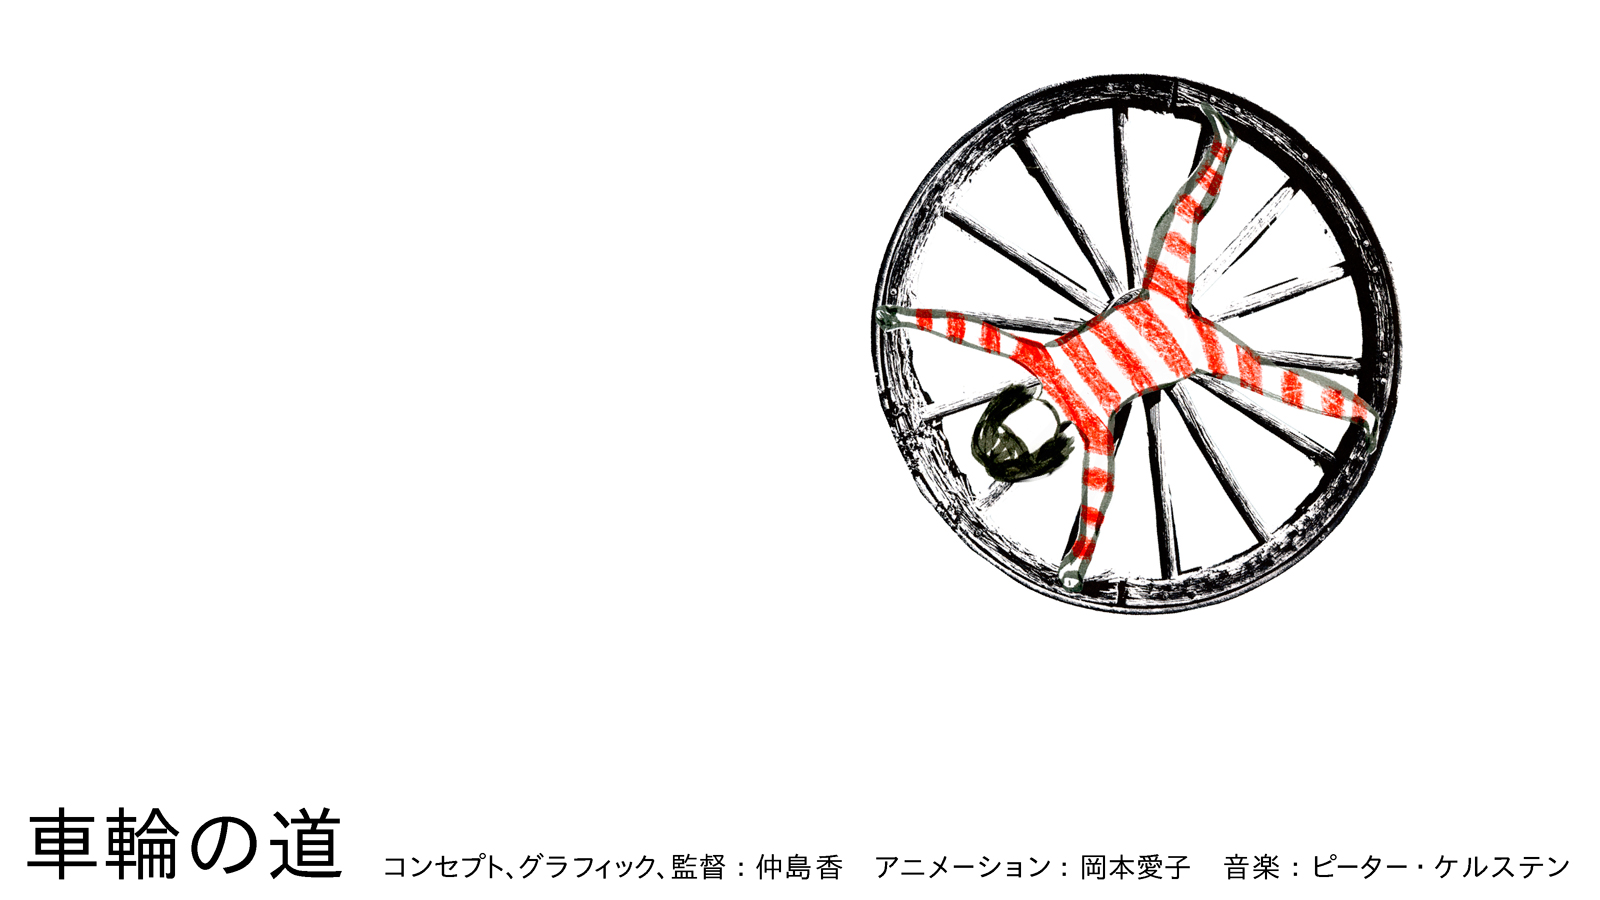 kaori-nakajima__pf-details_06.jpg